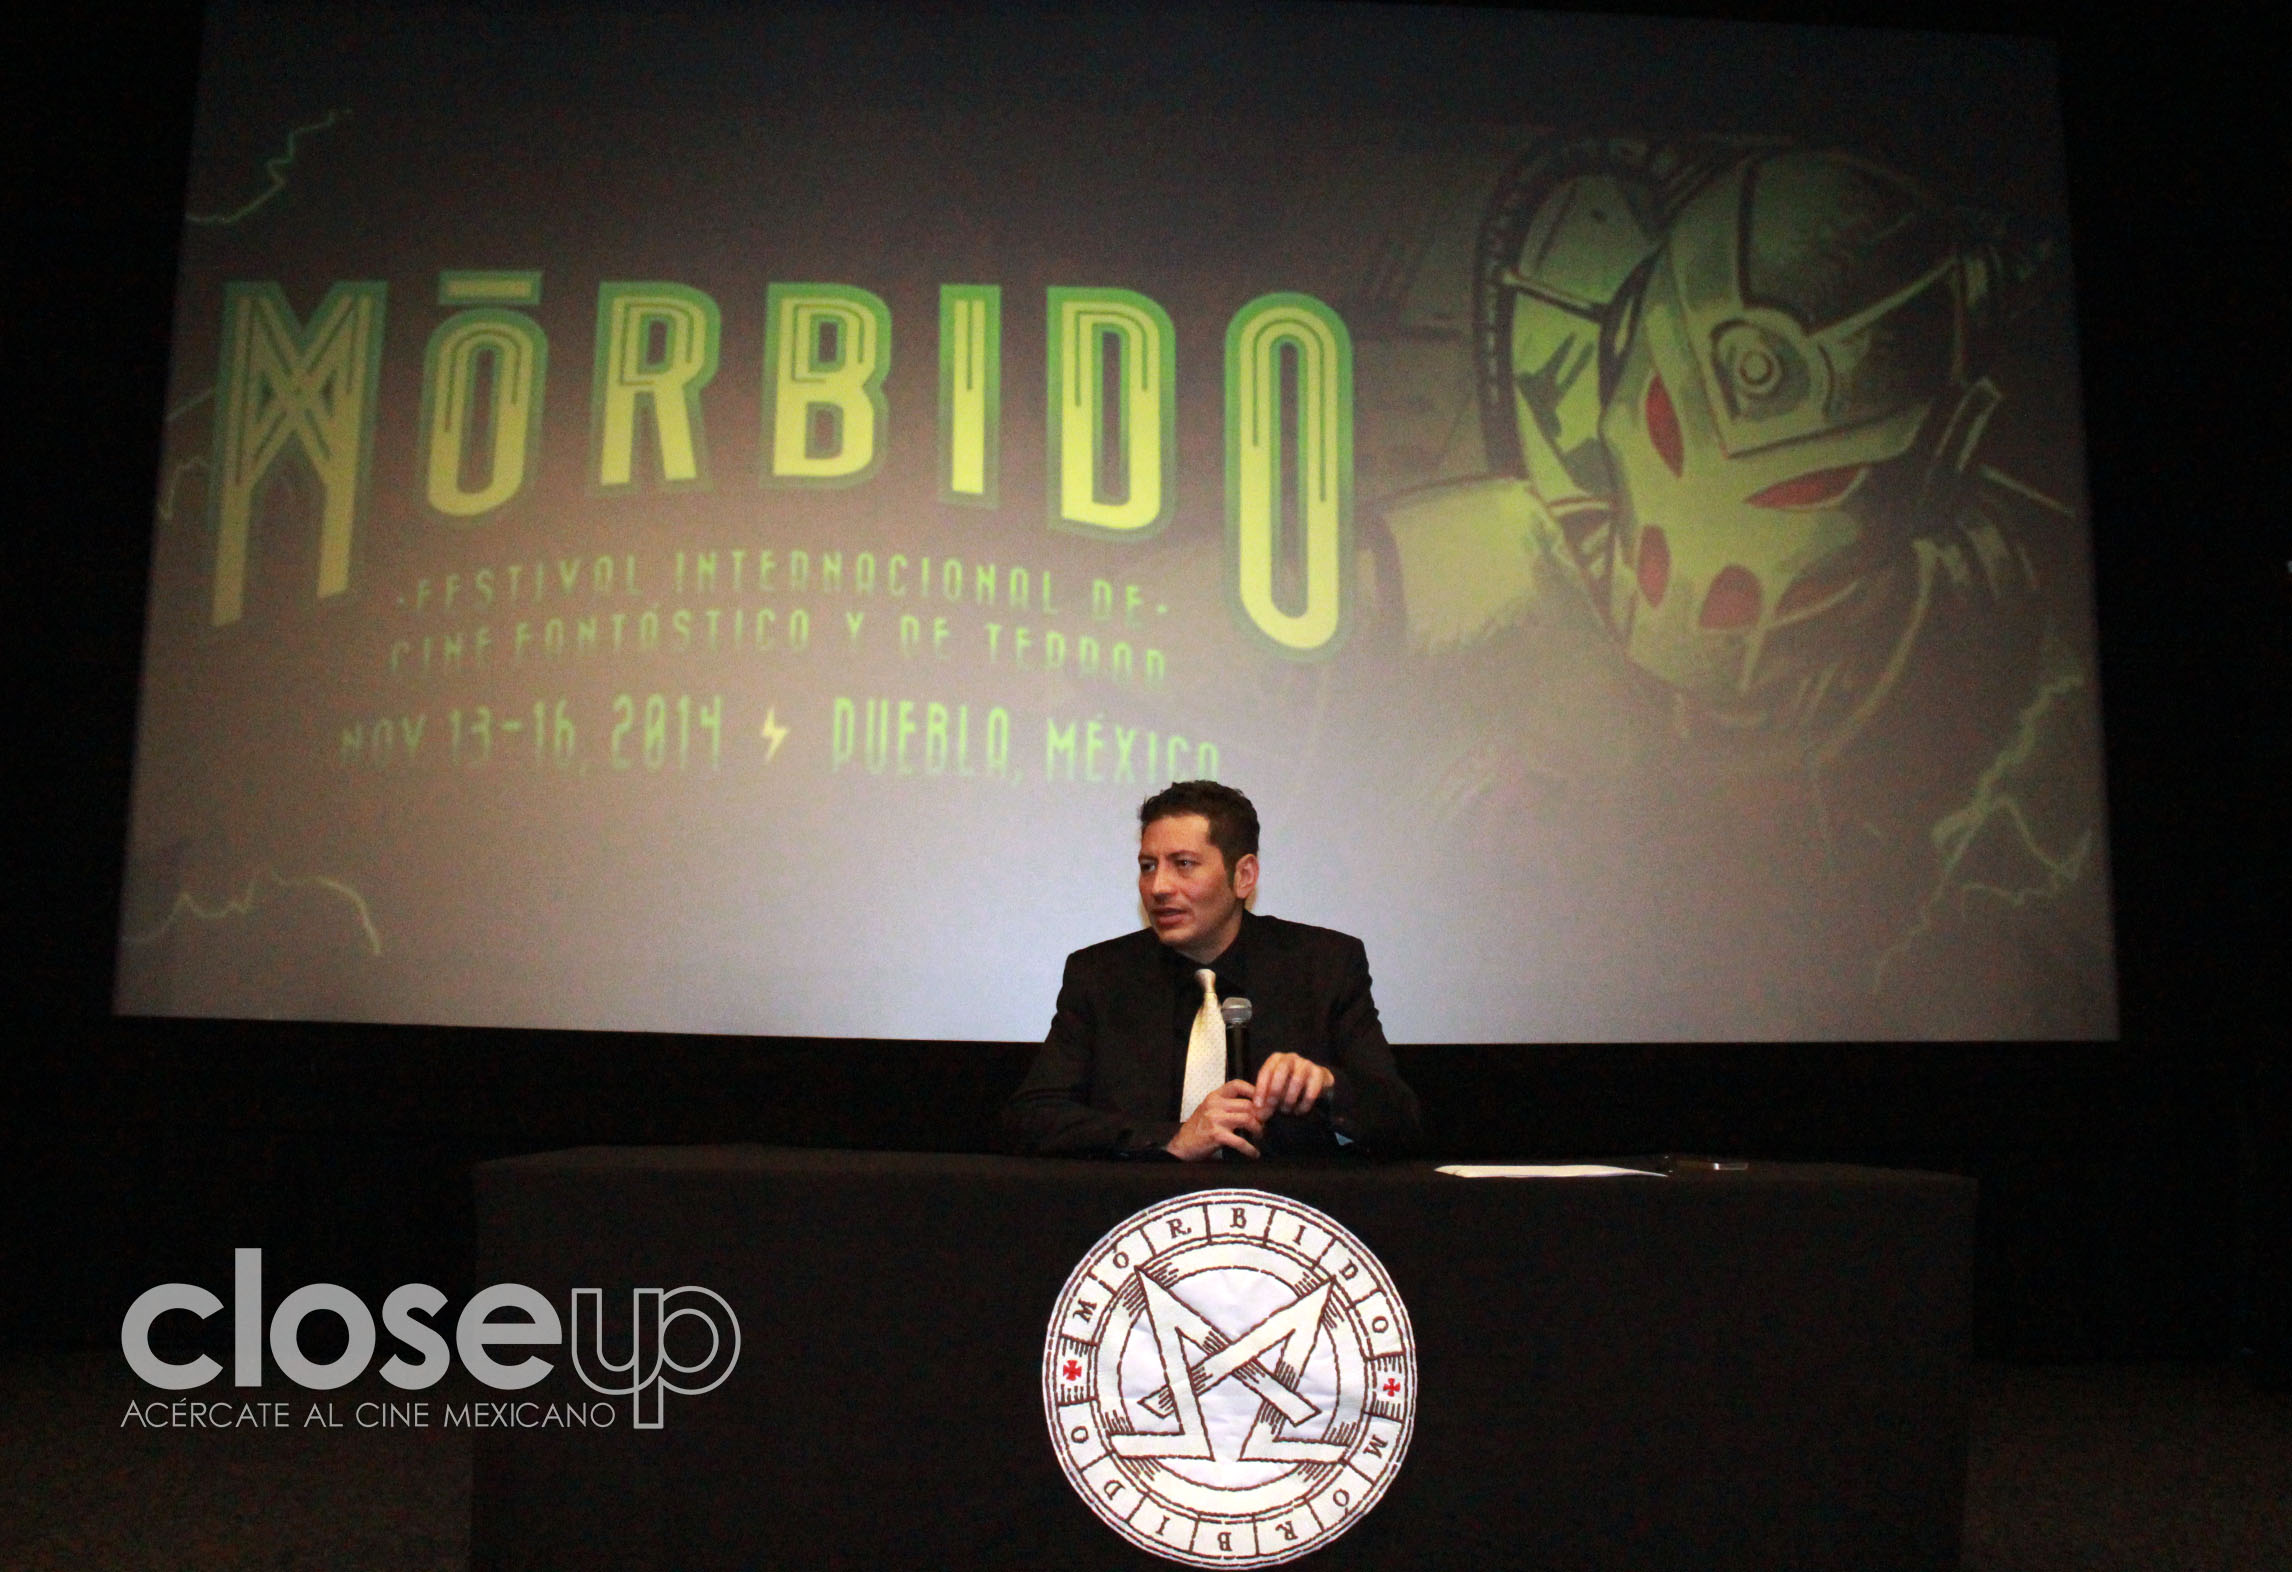 Estrenos en Mórbido Film Fest